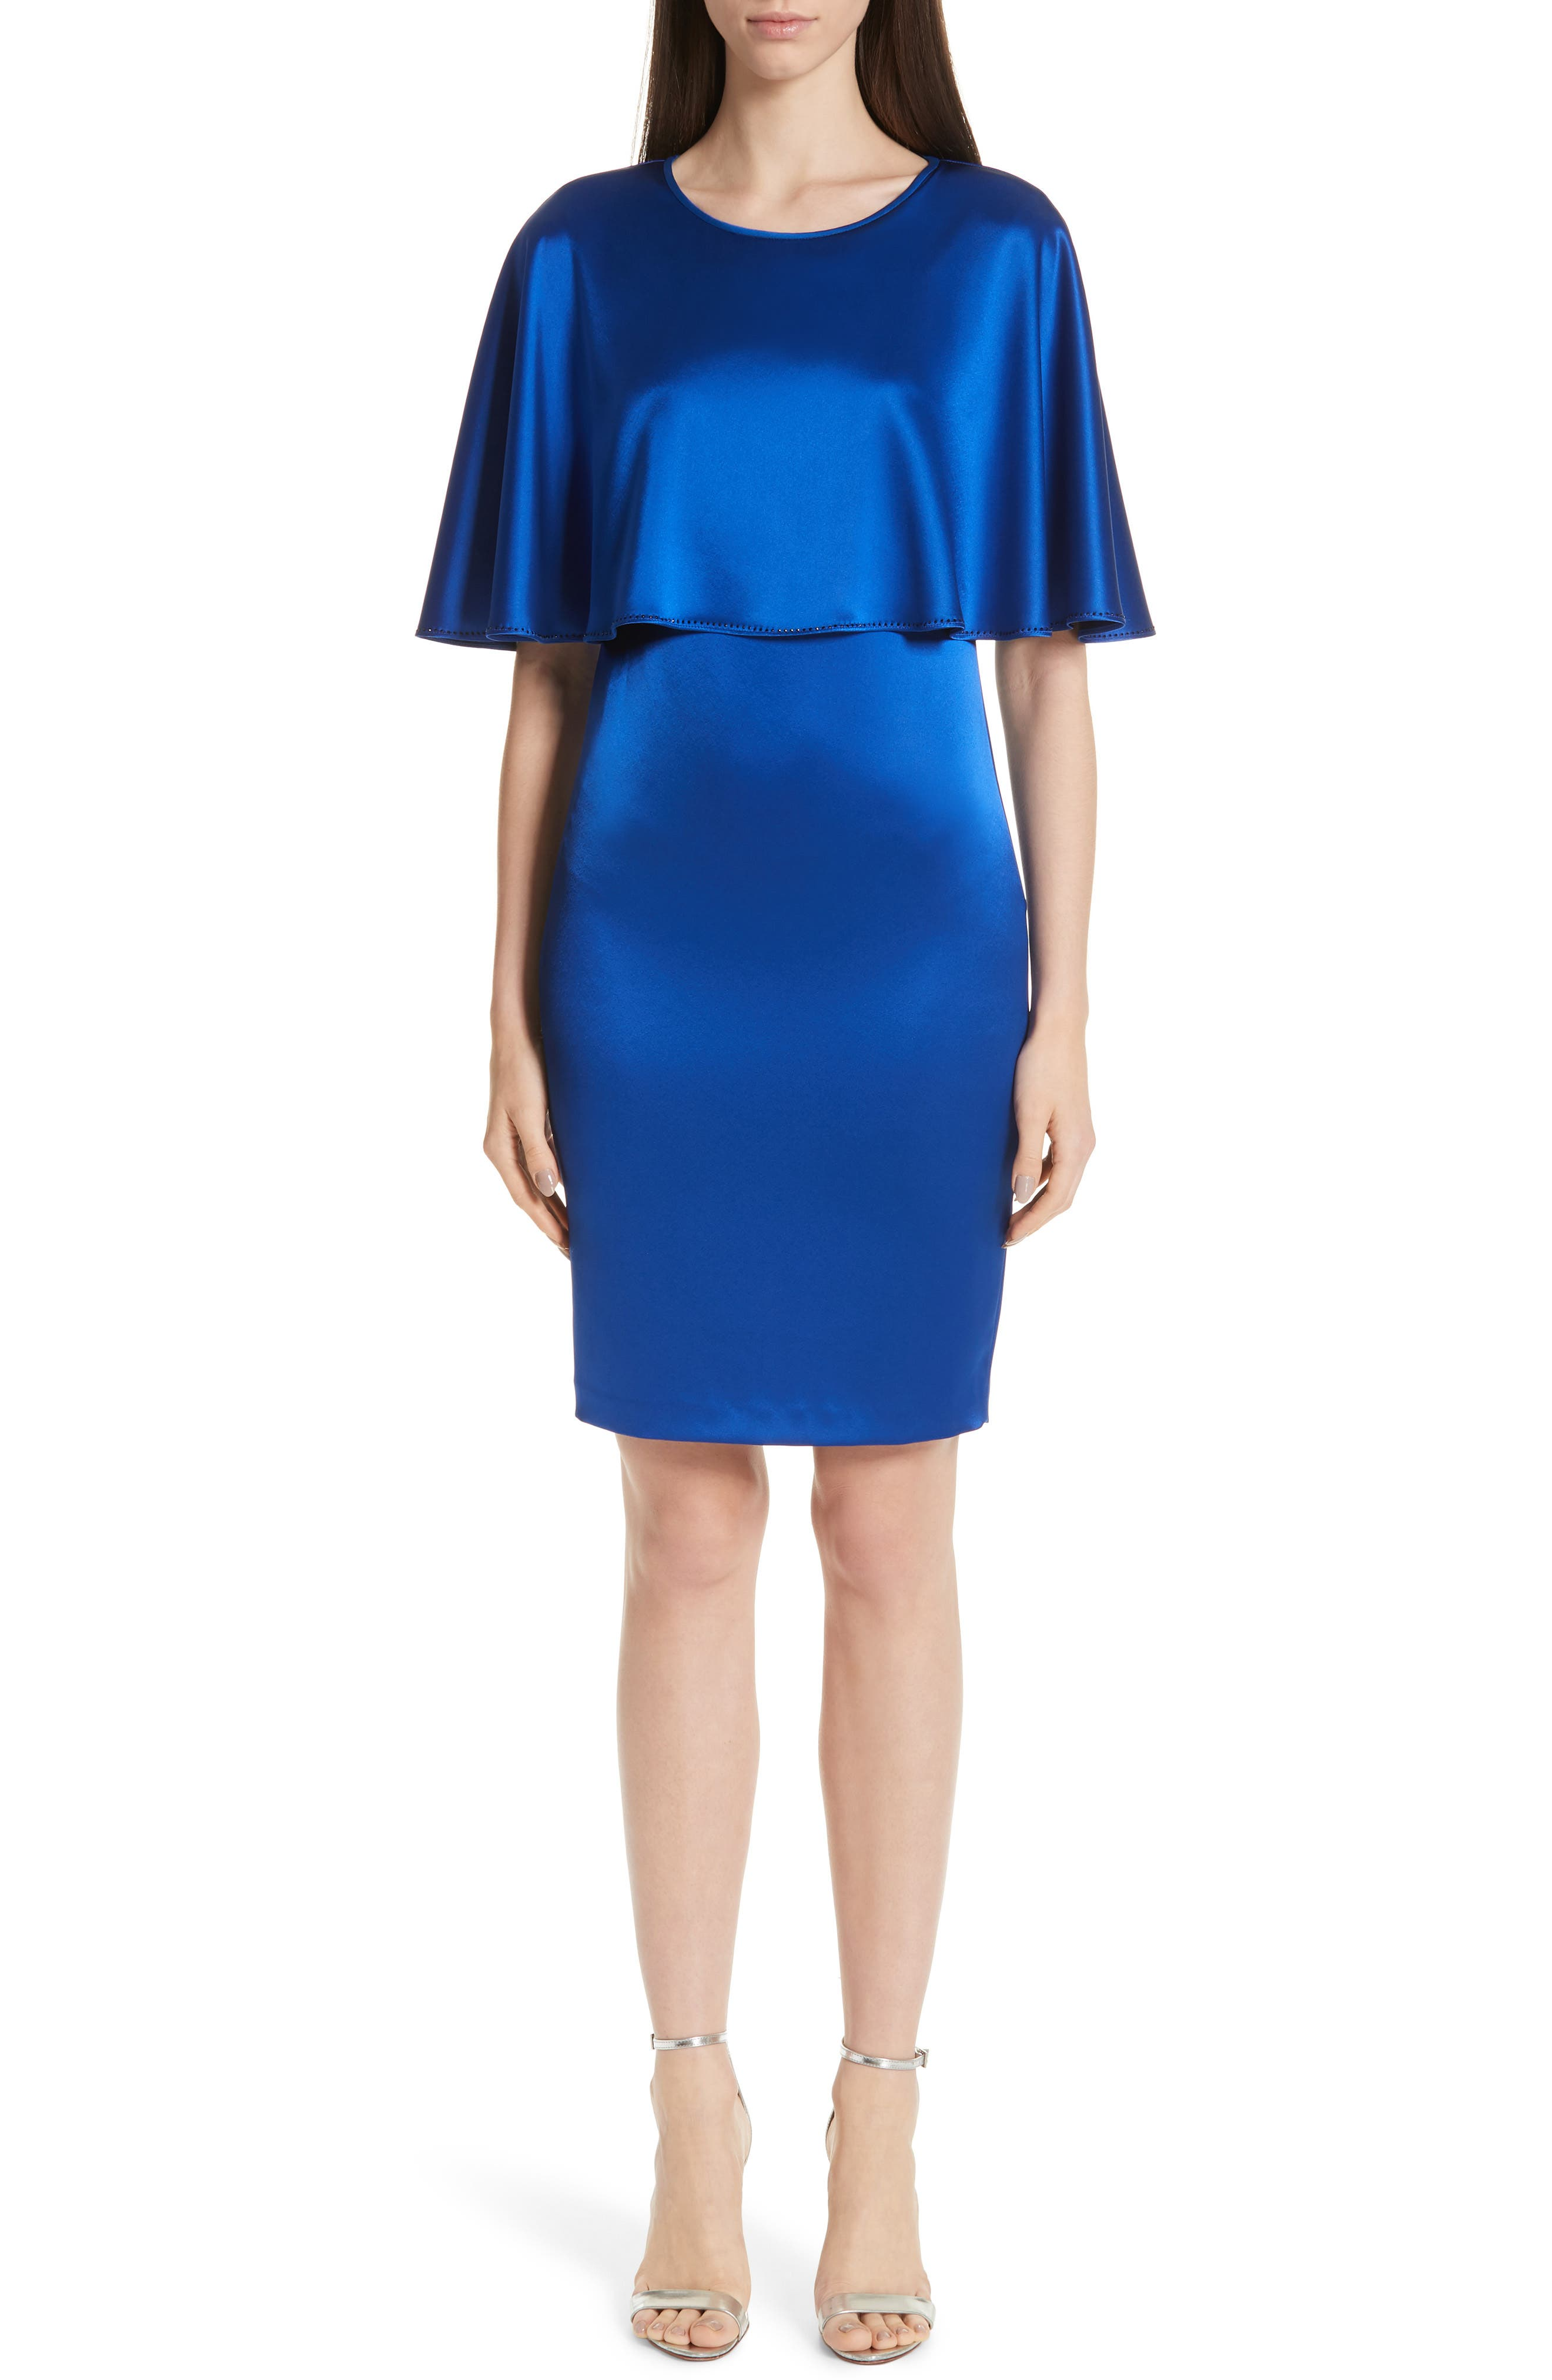 ST. JOHN COLLECTION Lighweight Liquid Satin Dress, Main, color, AZZURINE